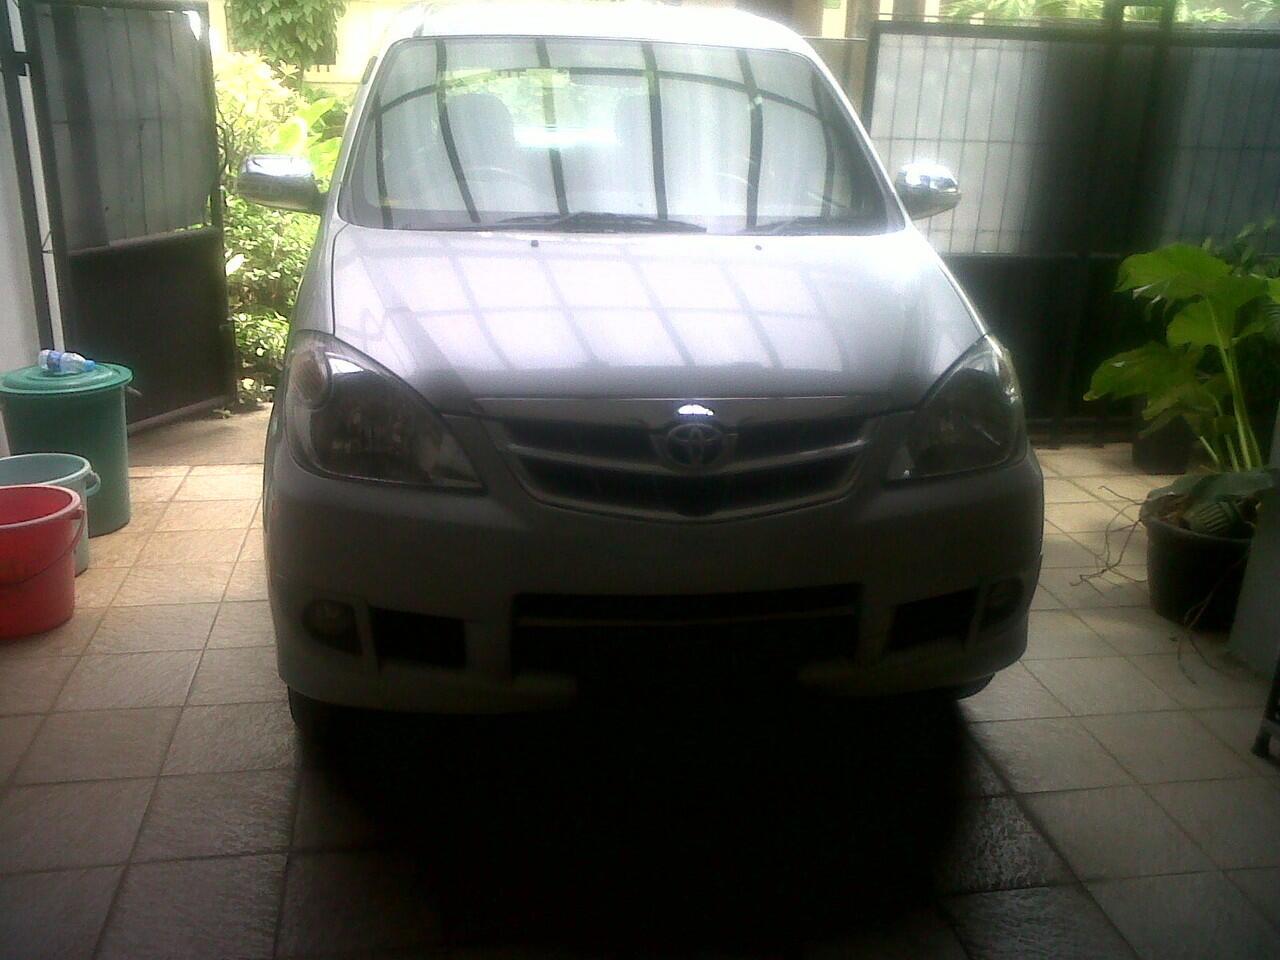 Dijual Toyota Avanza thn 2010..Mulus dan Murah Mas Broo131